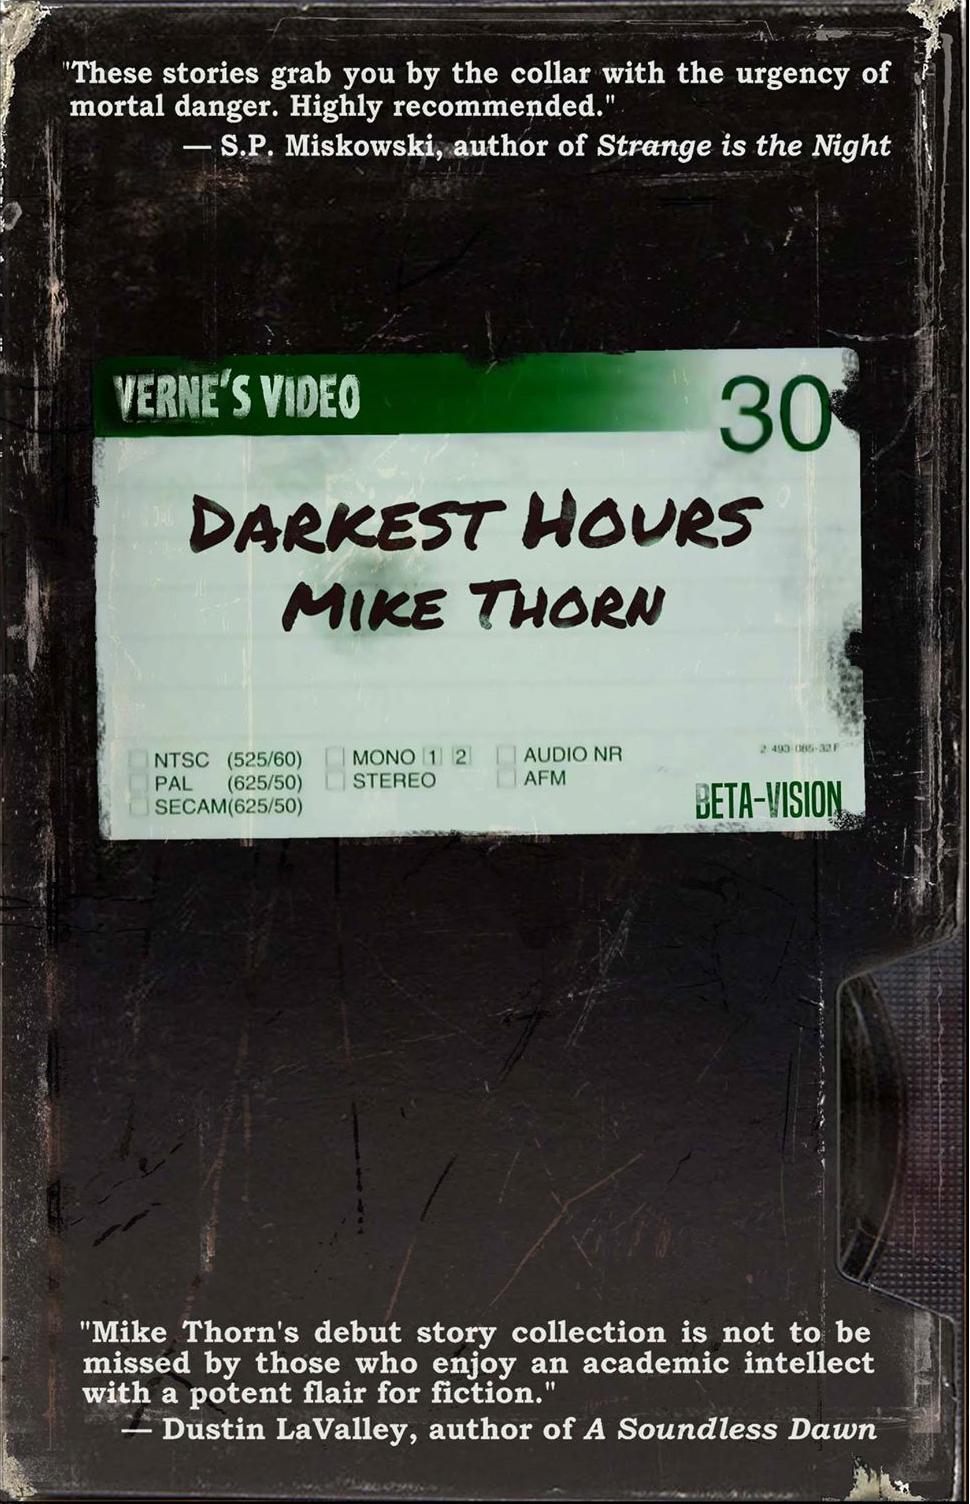 DarkestHoursCoverMikeThorn.png